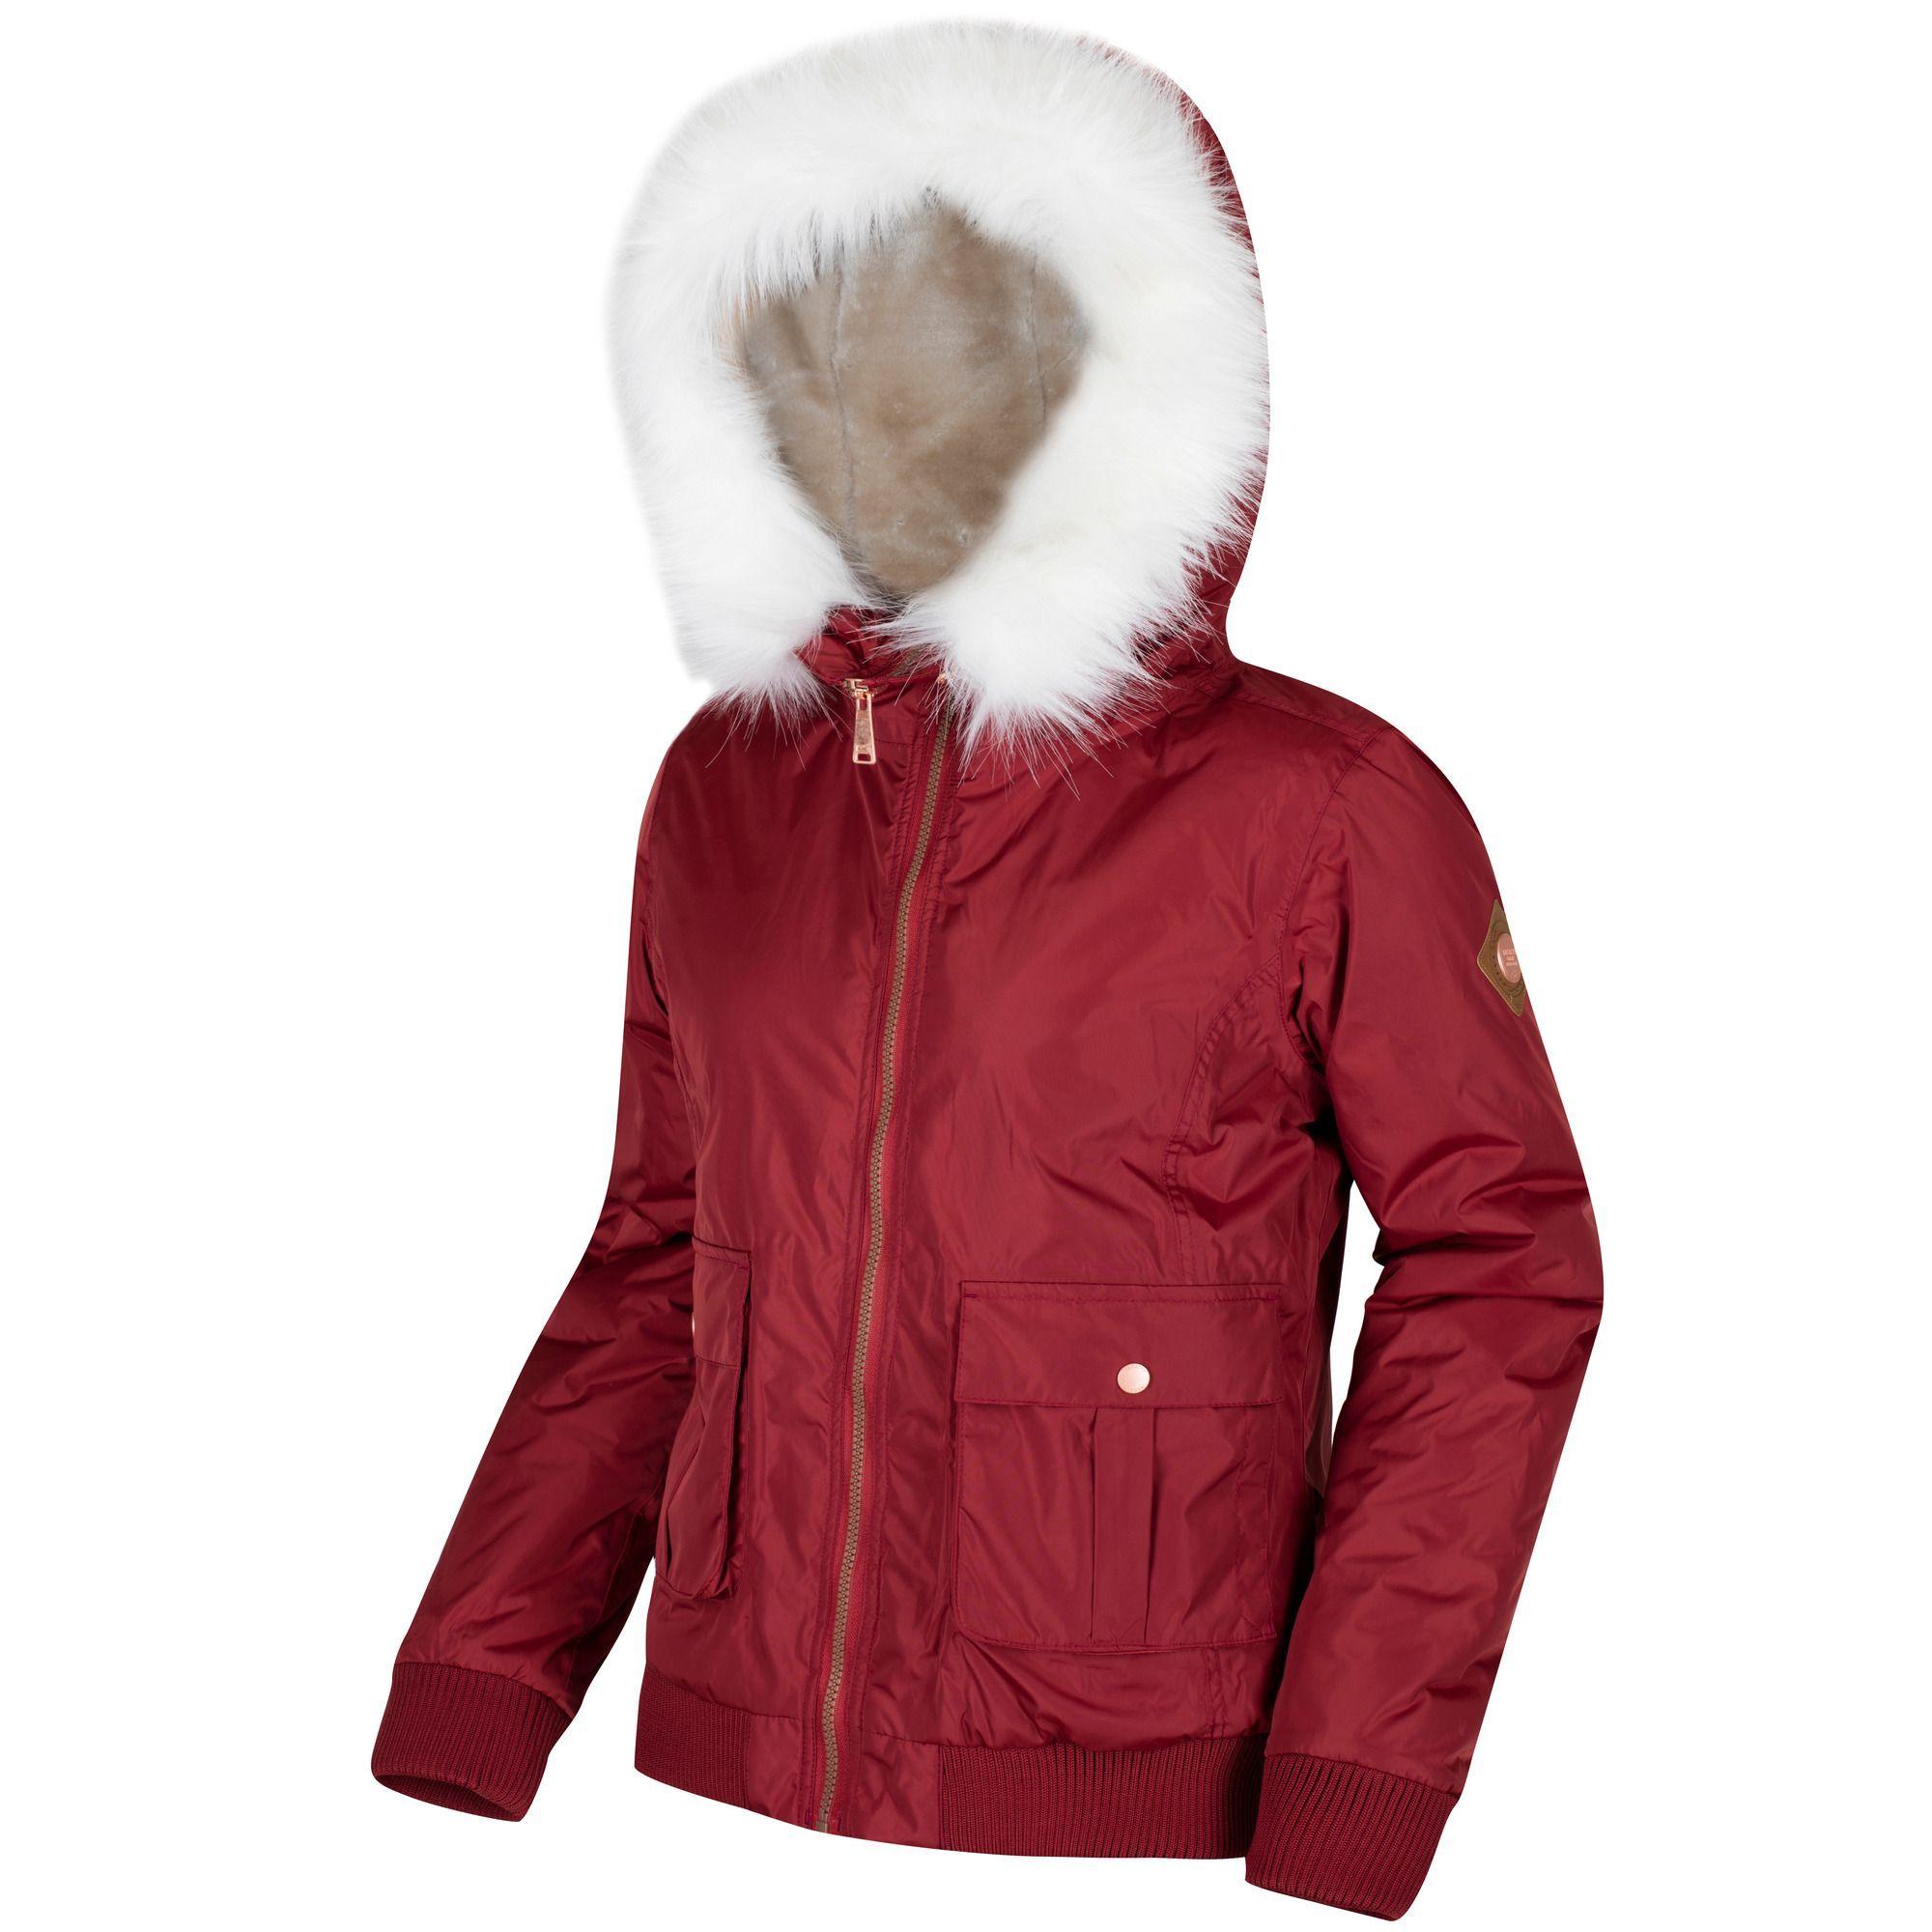 Regatta Womens/Ladies Berdine Bomber Jacket